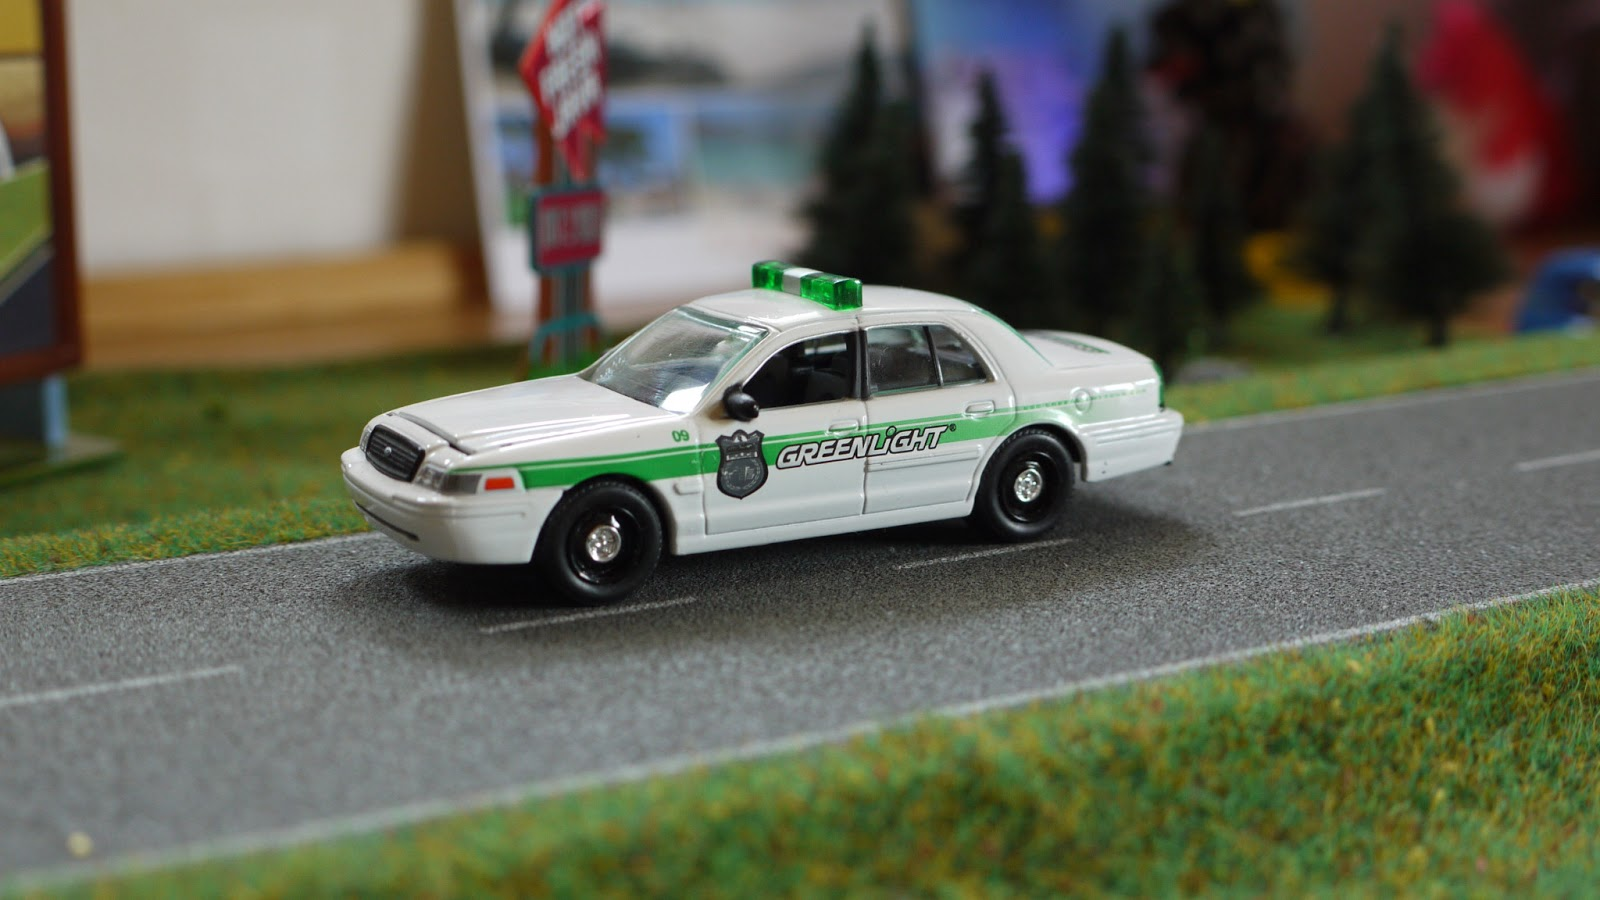 2006 Ford Taurus >> Diecast cars 1/64, Modellautos 1:64, Modellbilar 1:64